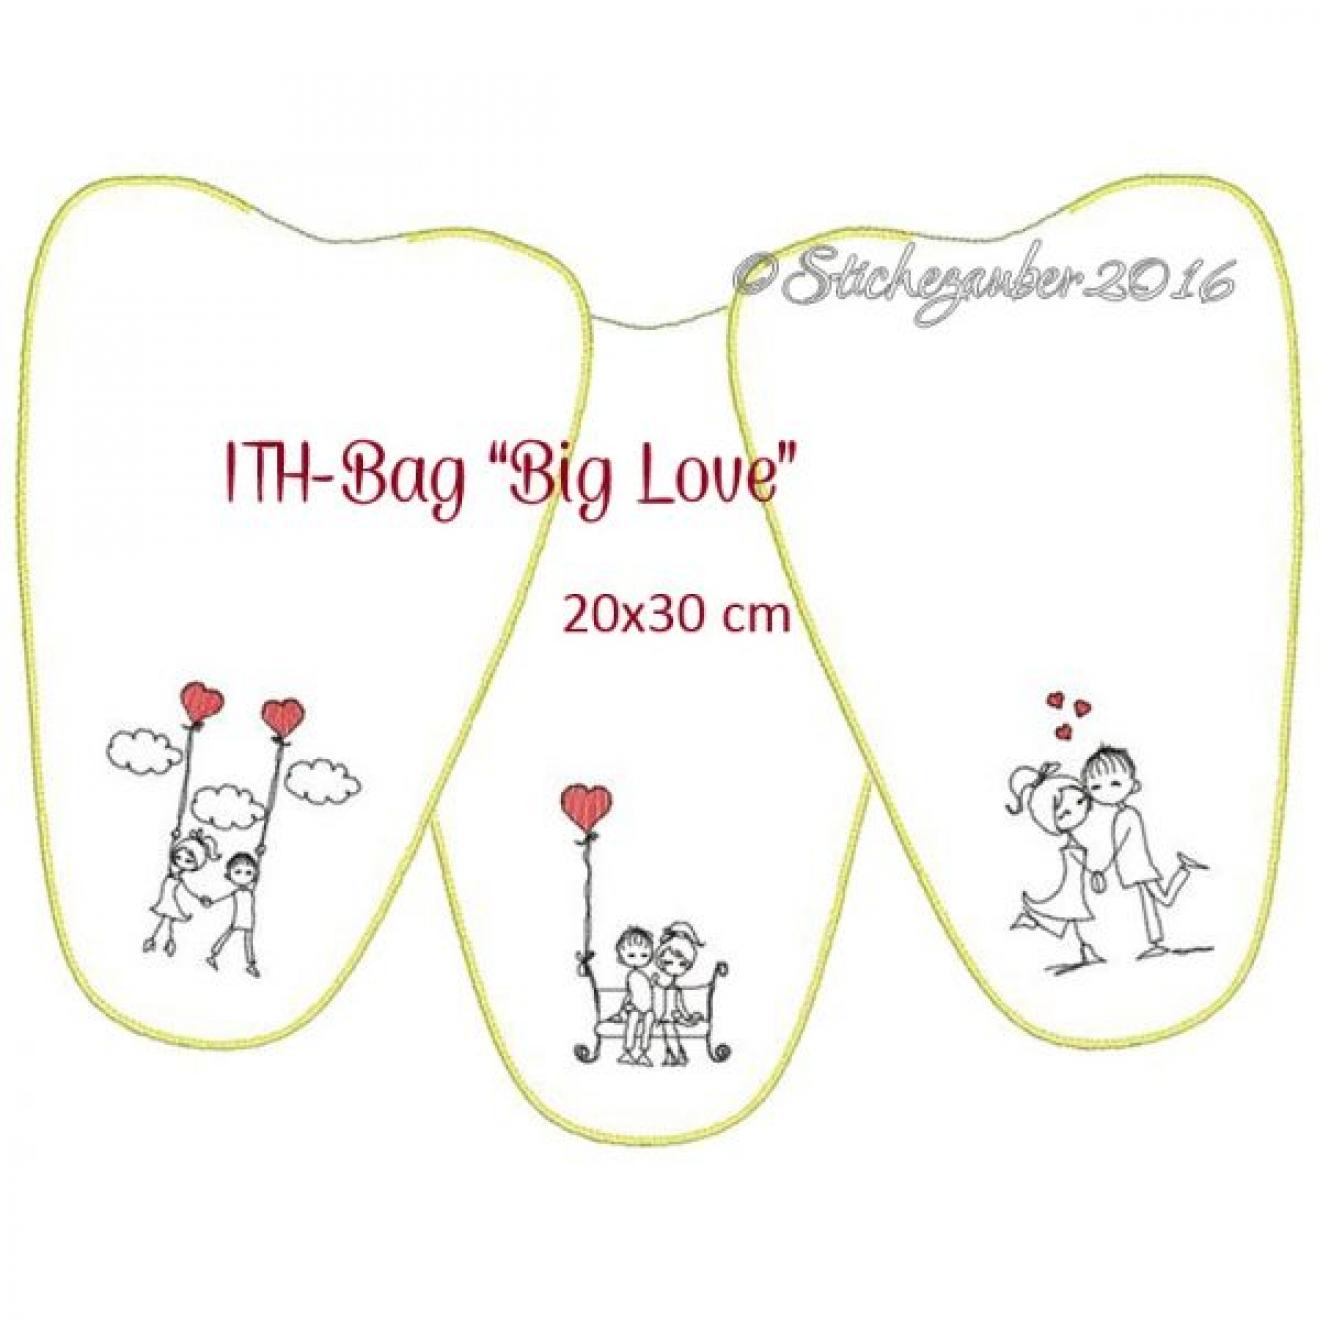 Ith Tasche Big Love 20x30 Cm